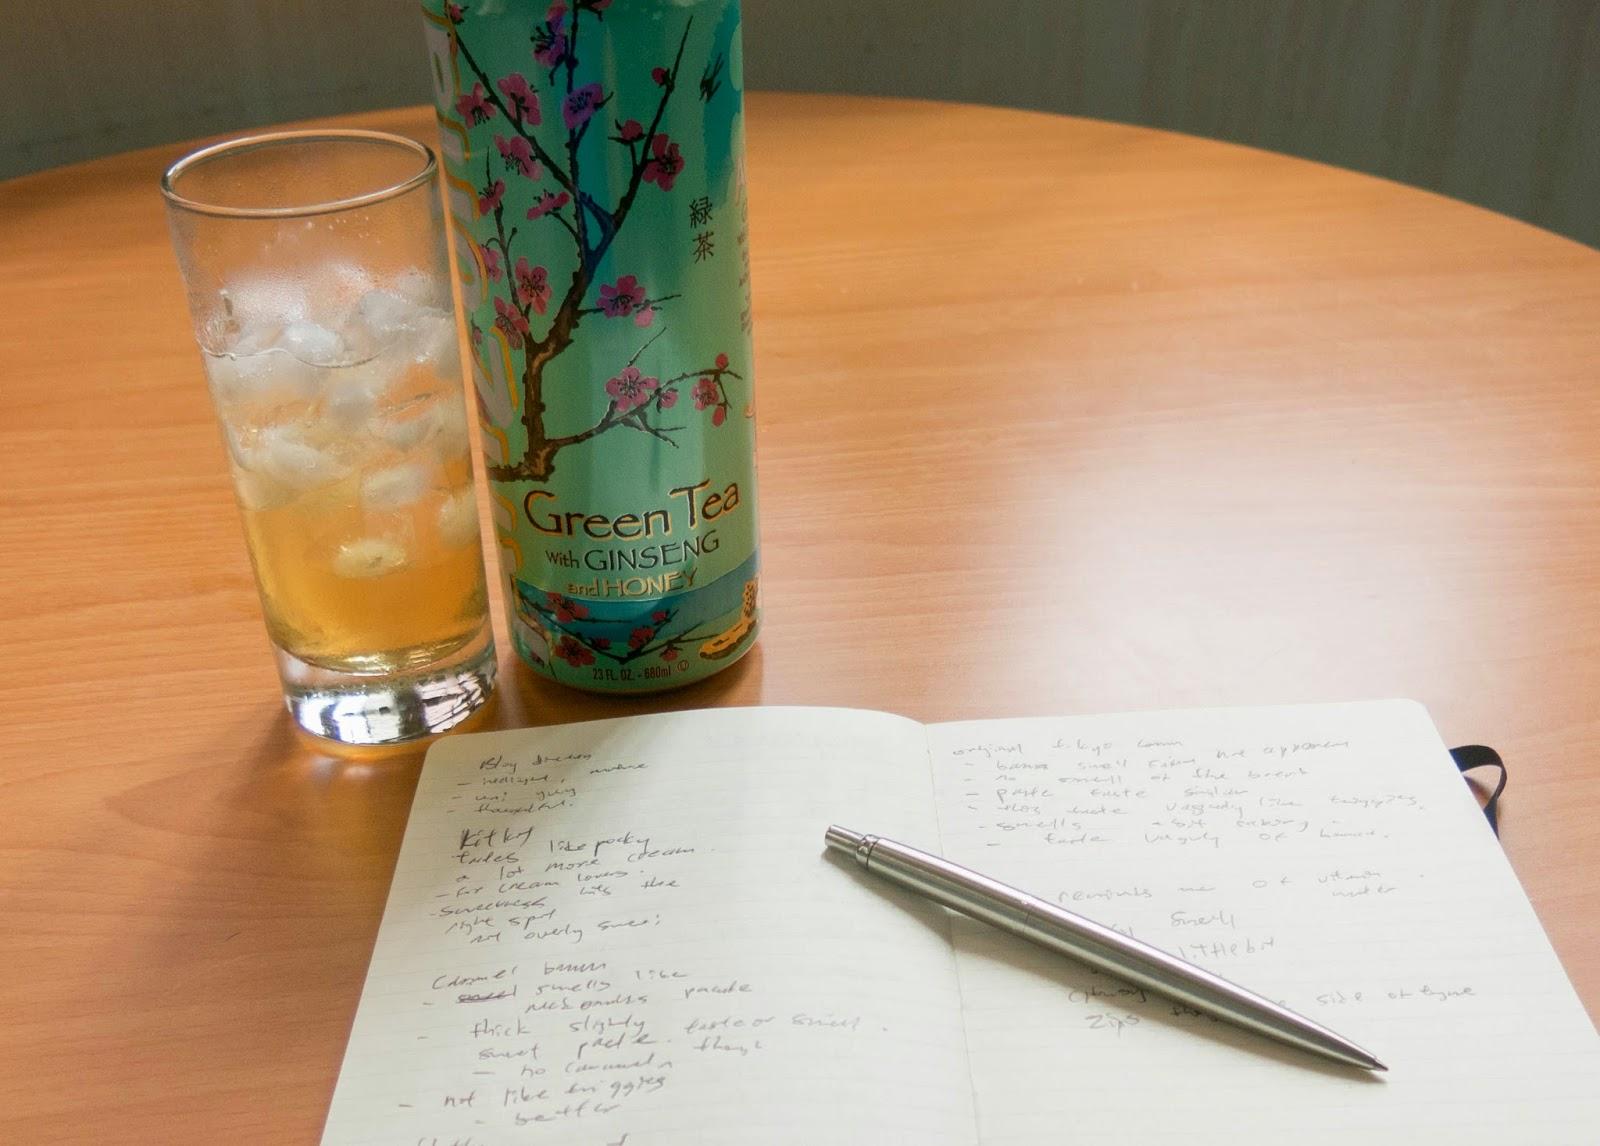 drinking arizona tea while writing notes